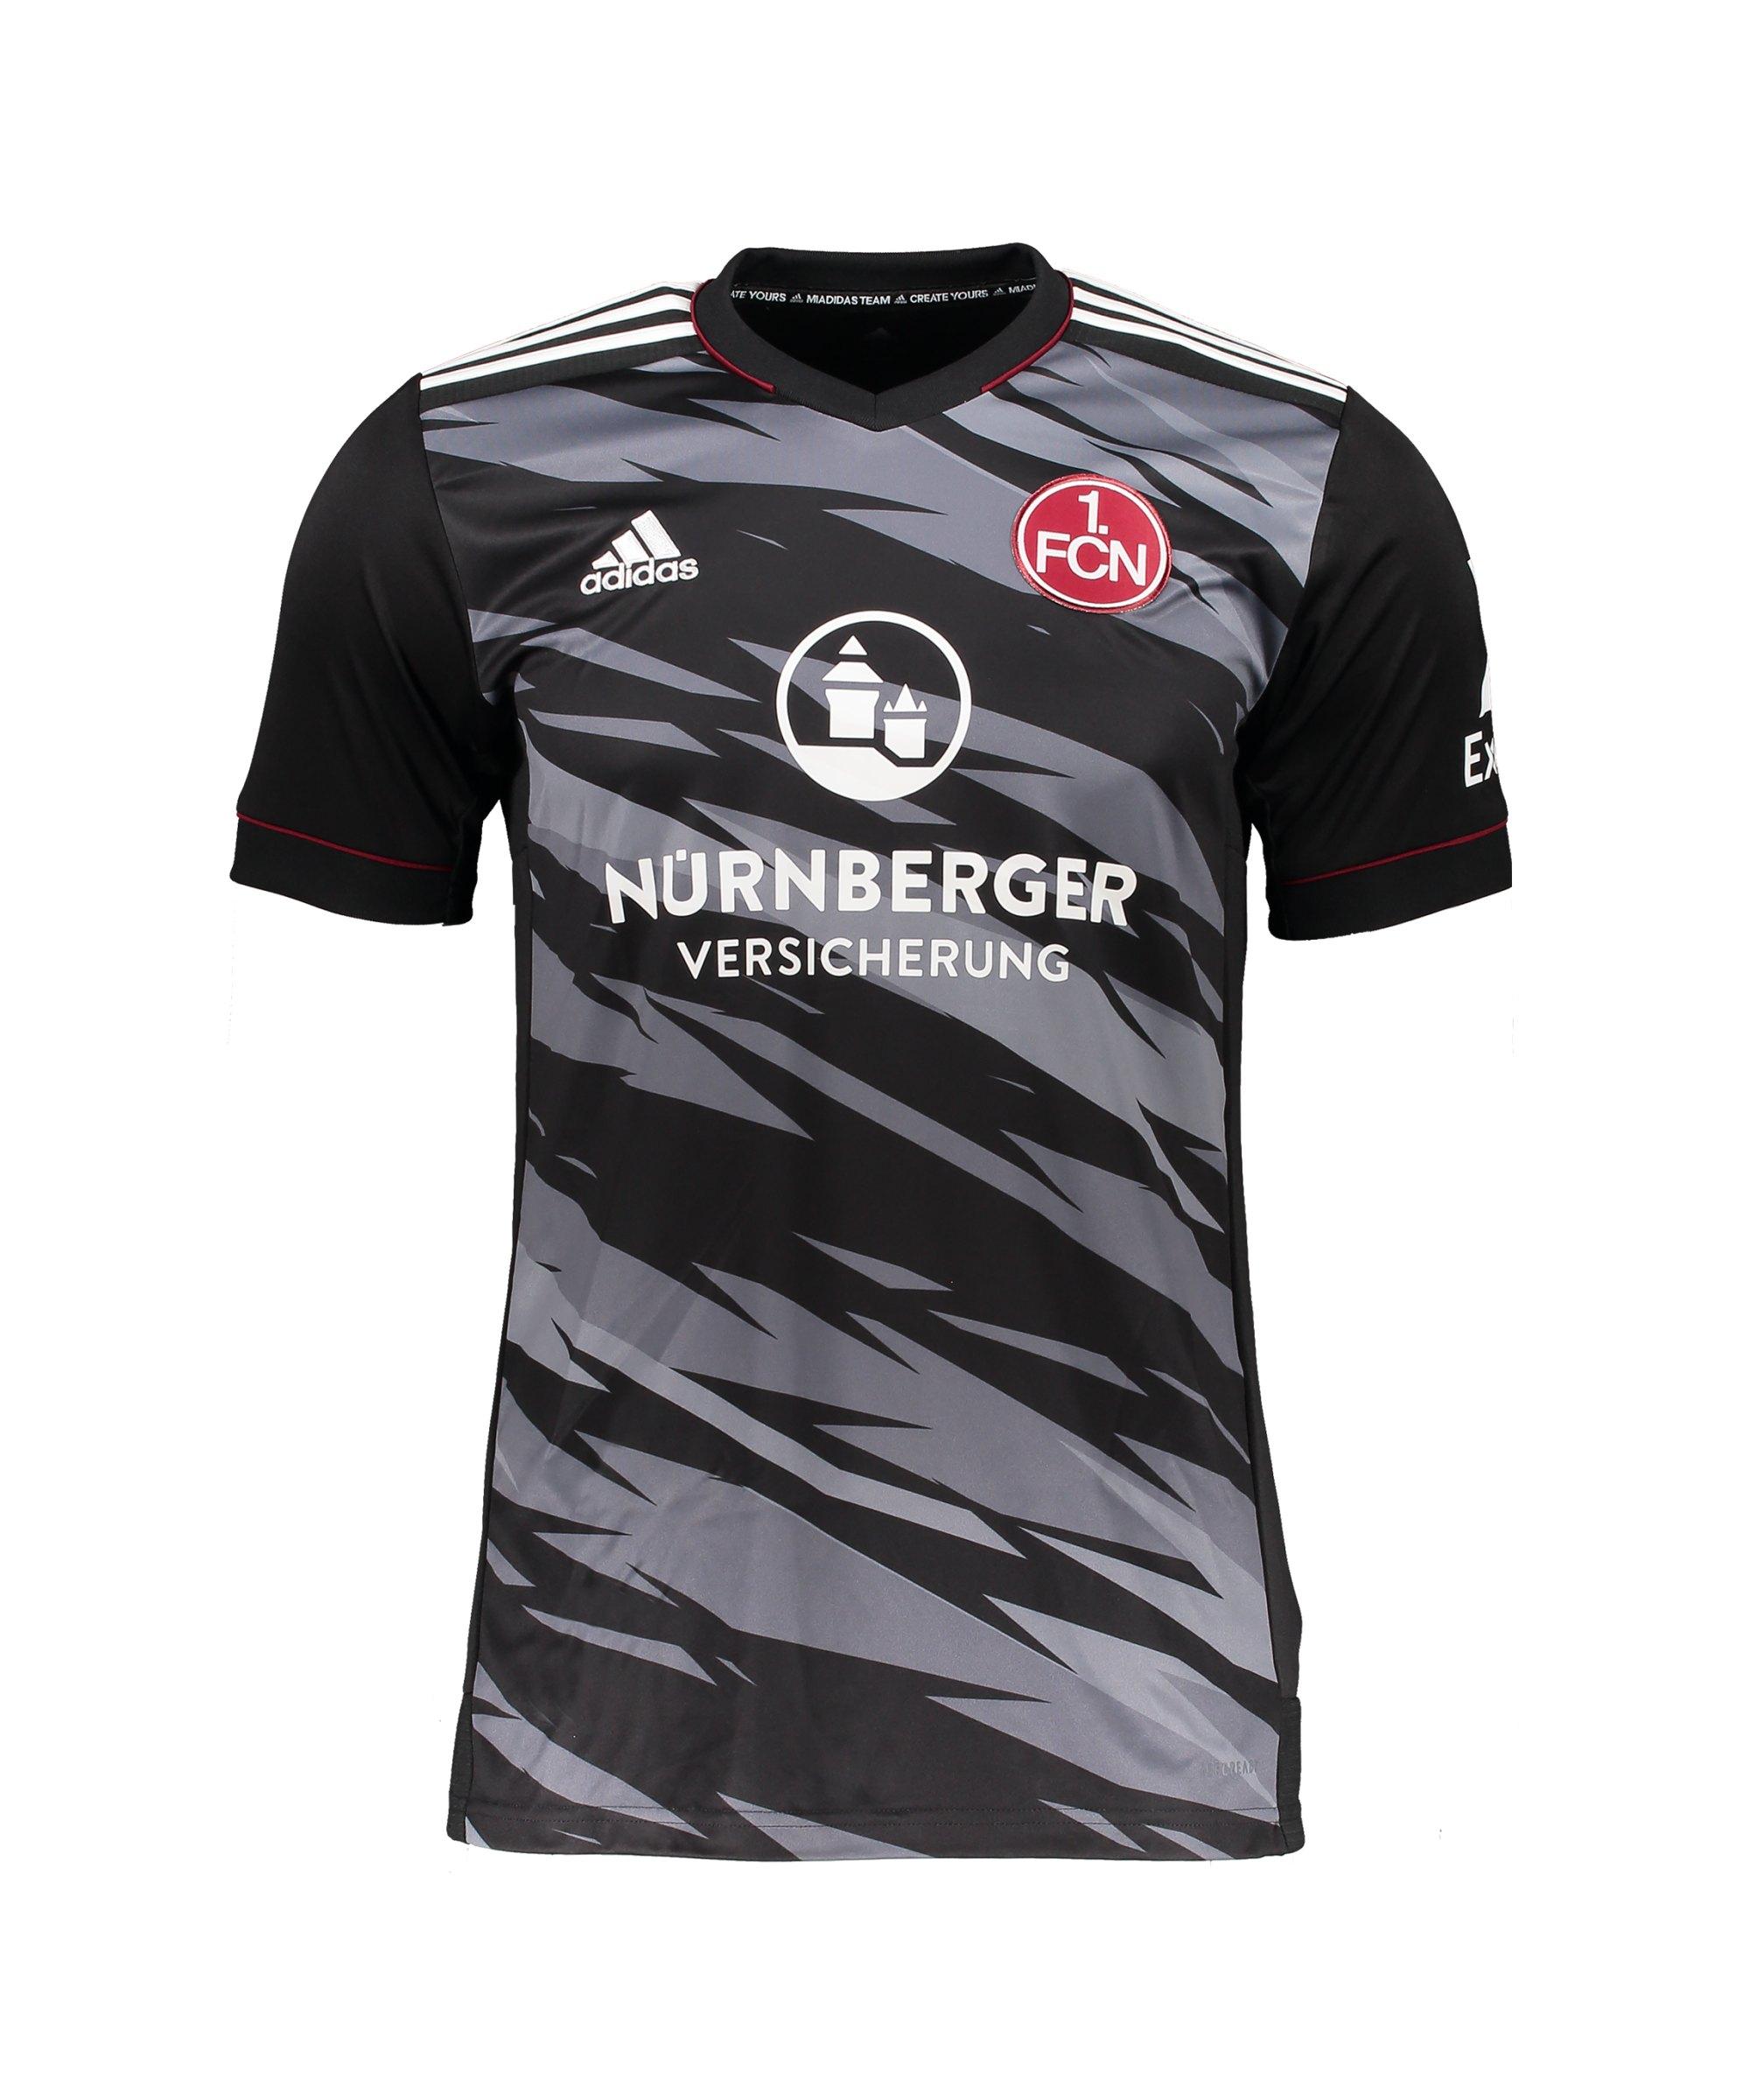 adidas 1. FC Nürnberg Trikot 3rd 2021/2022 Kids Schwarz - schwarz